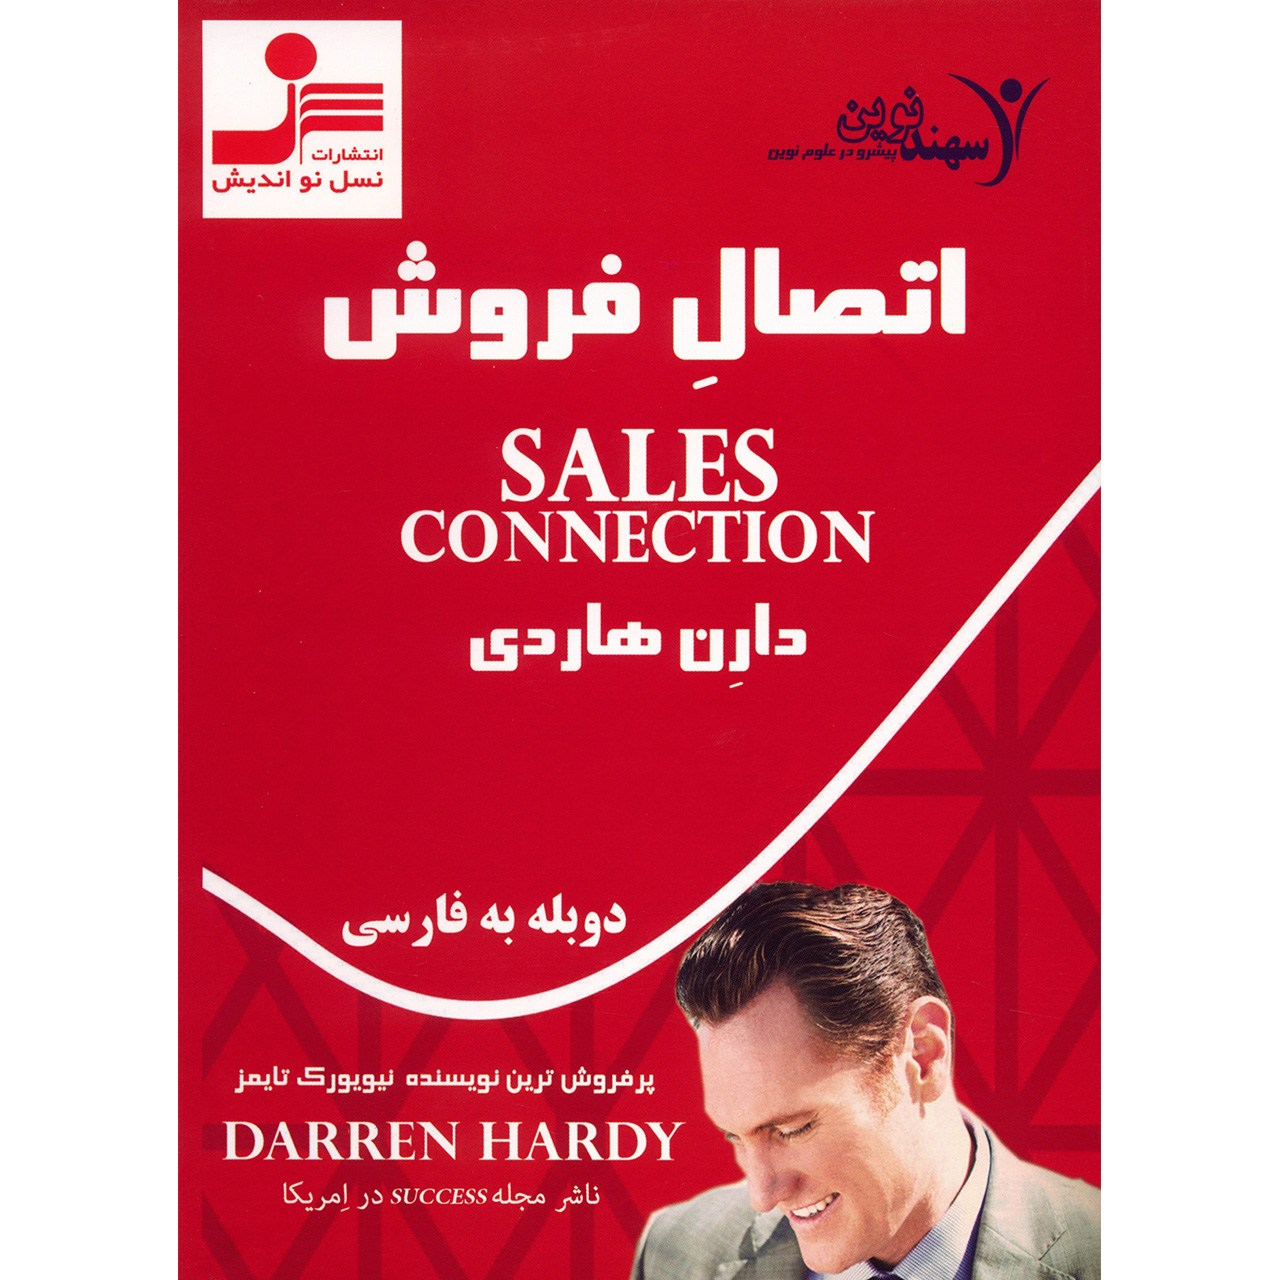 کتاب صوتي اتصال فروش